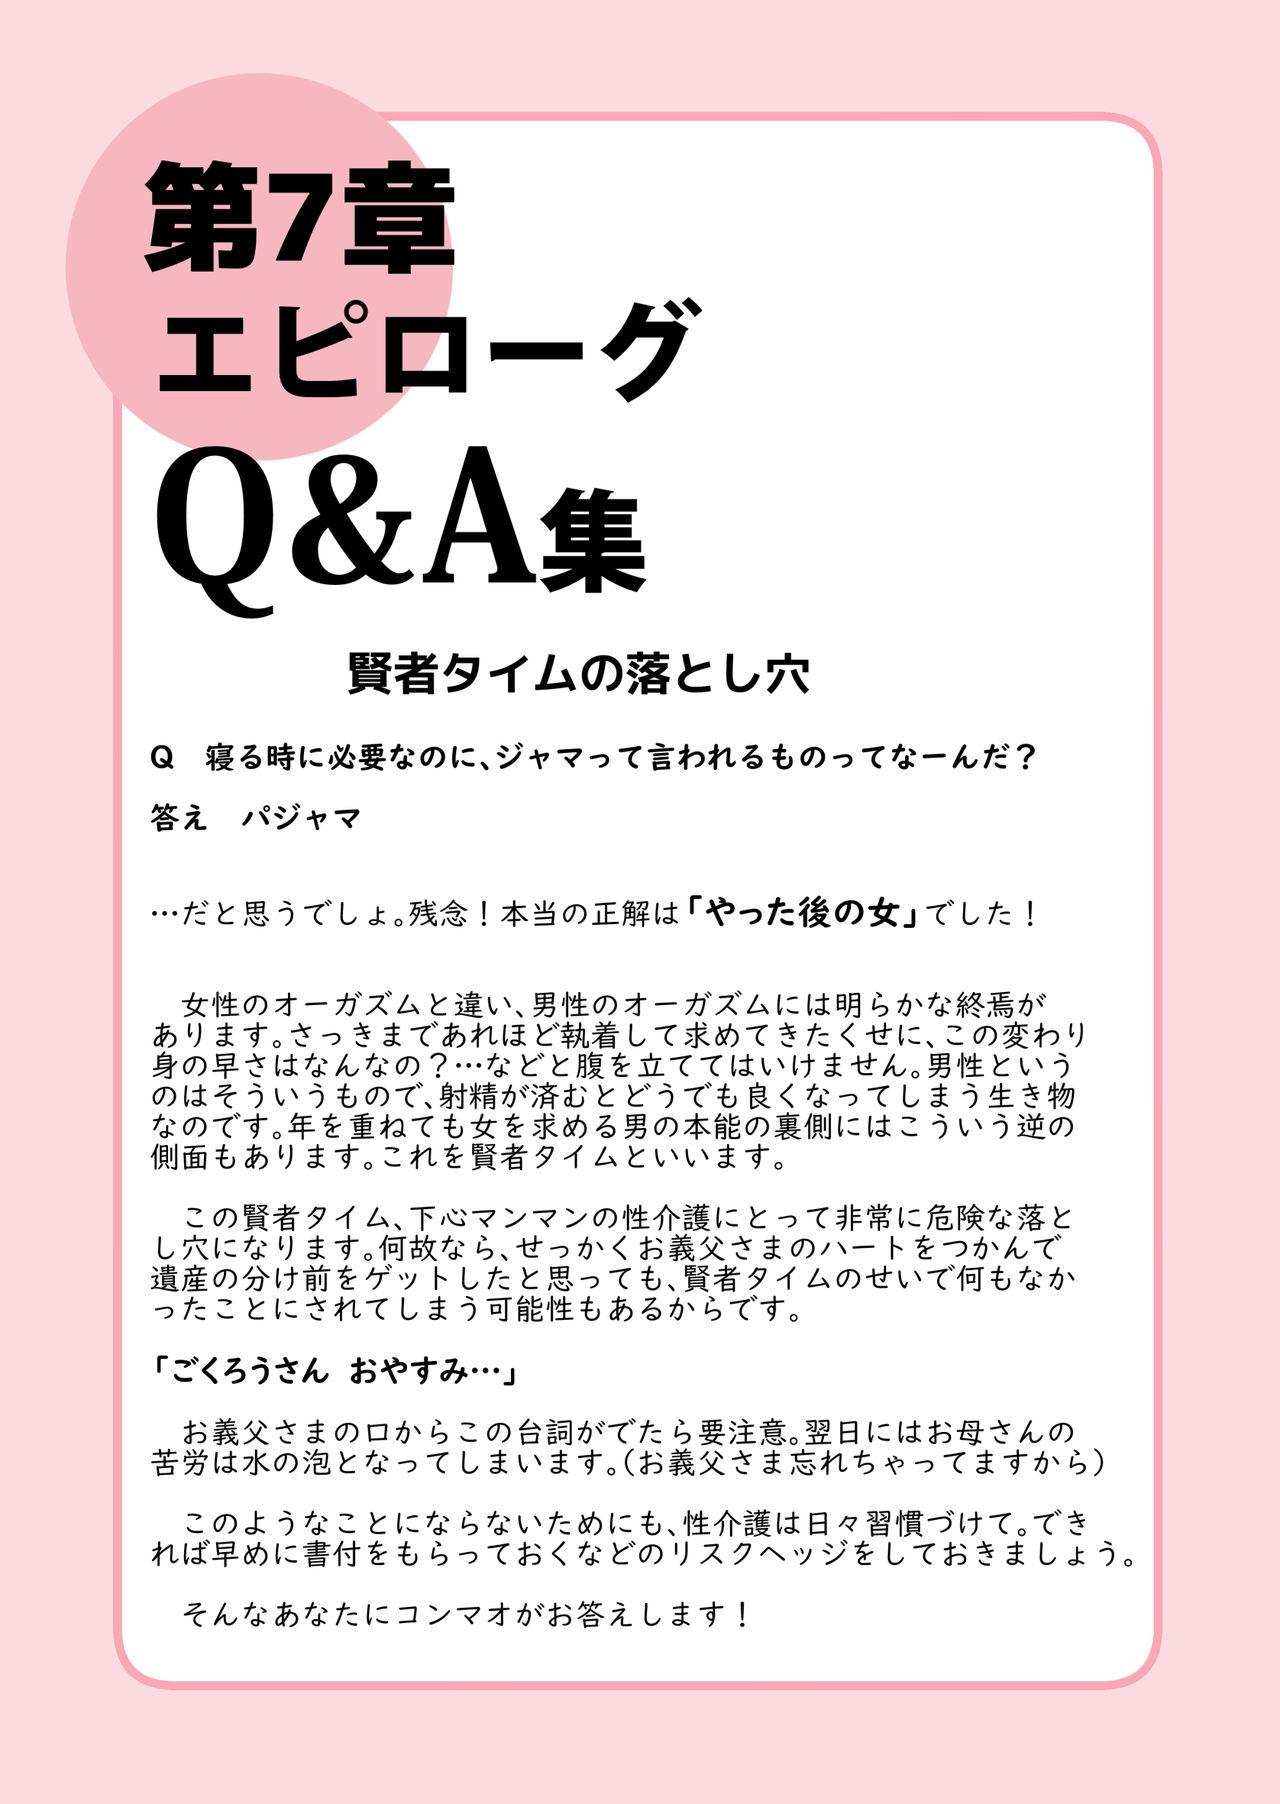 Isogasii Okaasan No Tamuno Sasa Rouzin Seikaigo | Guide for Elderly Sex Health Care to Busy Mom 64